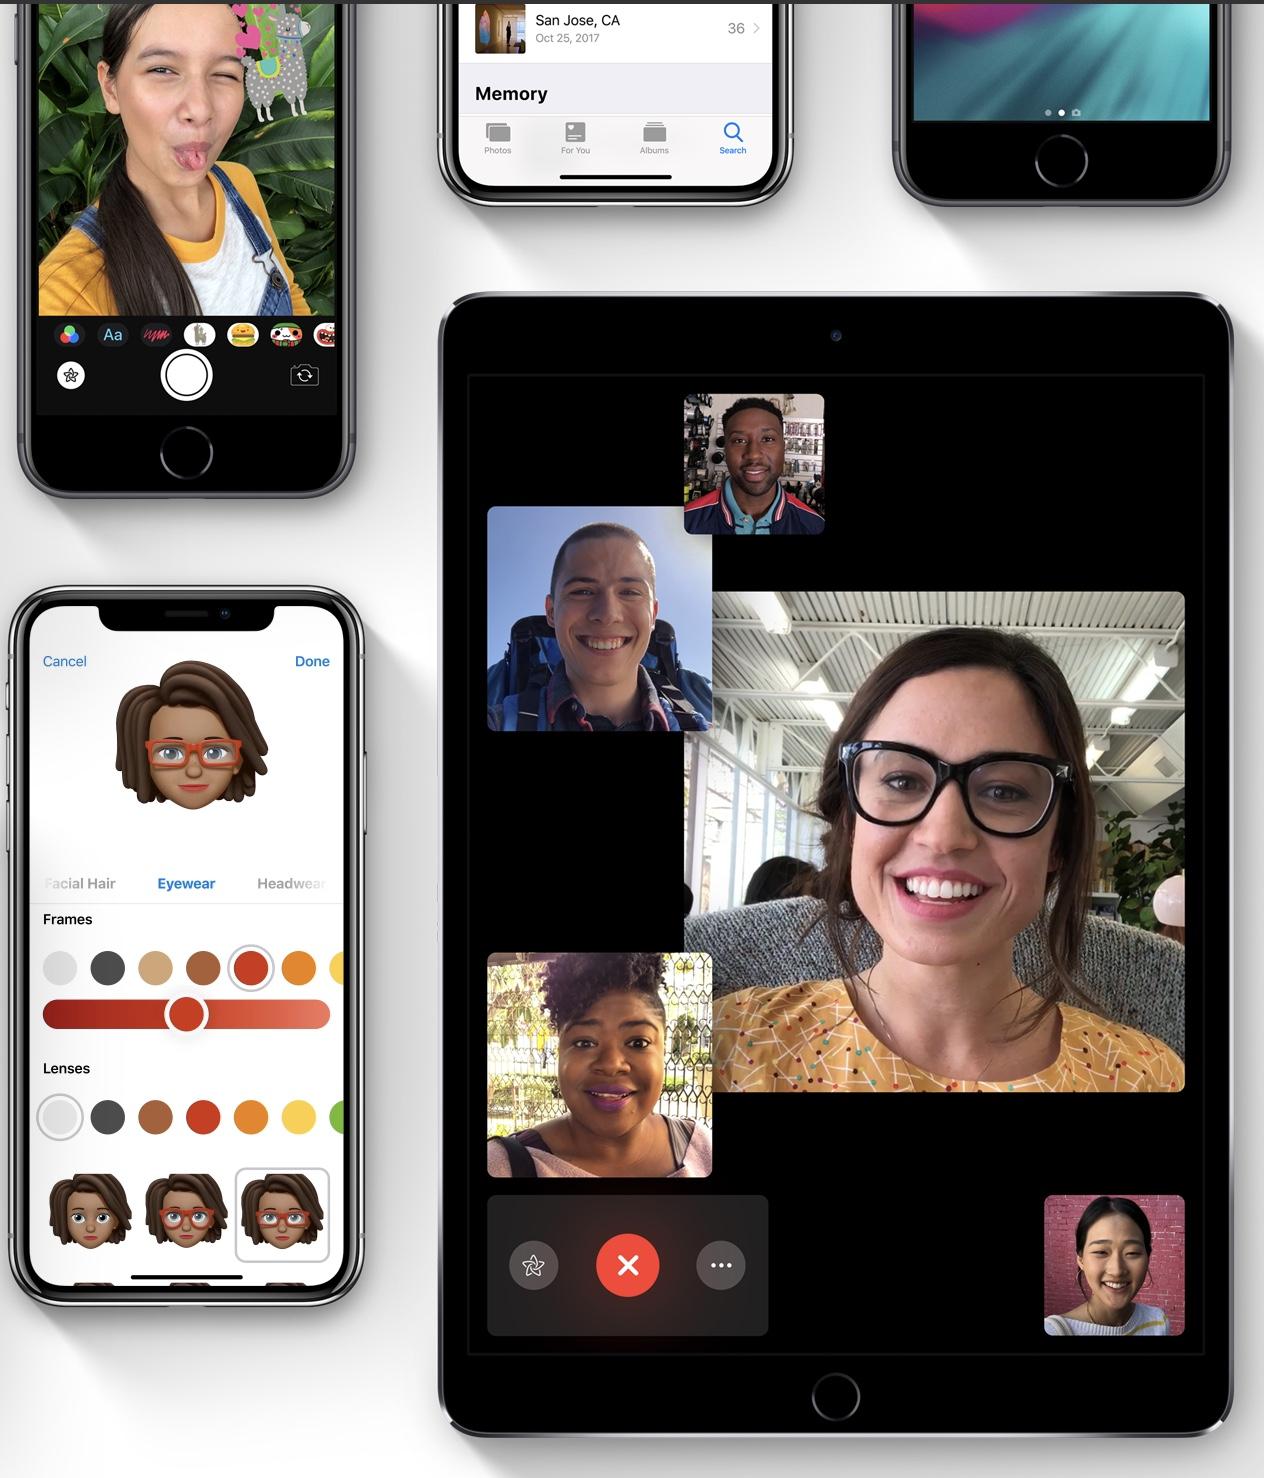 Apple posts iOS 12.0.1